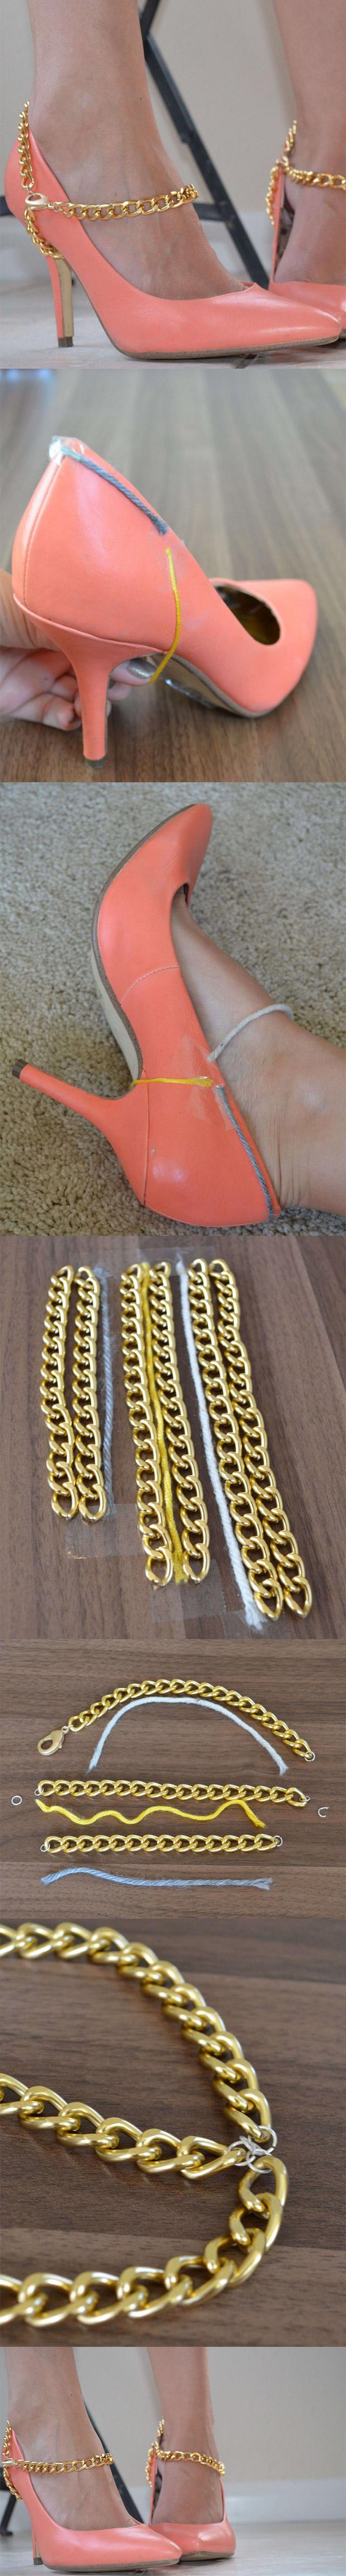 Jewelry Chains (9)